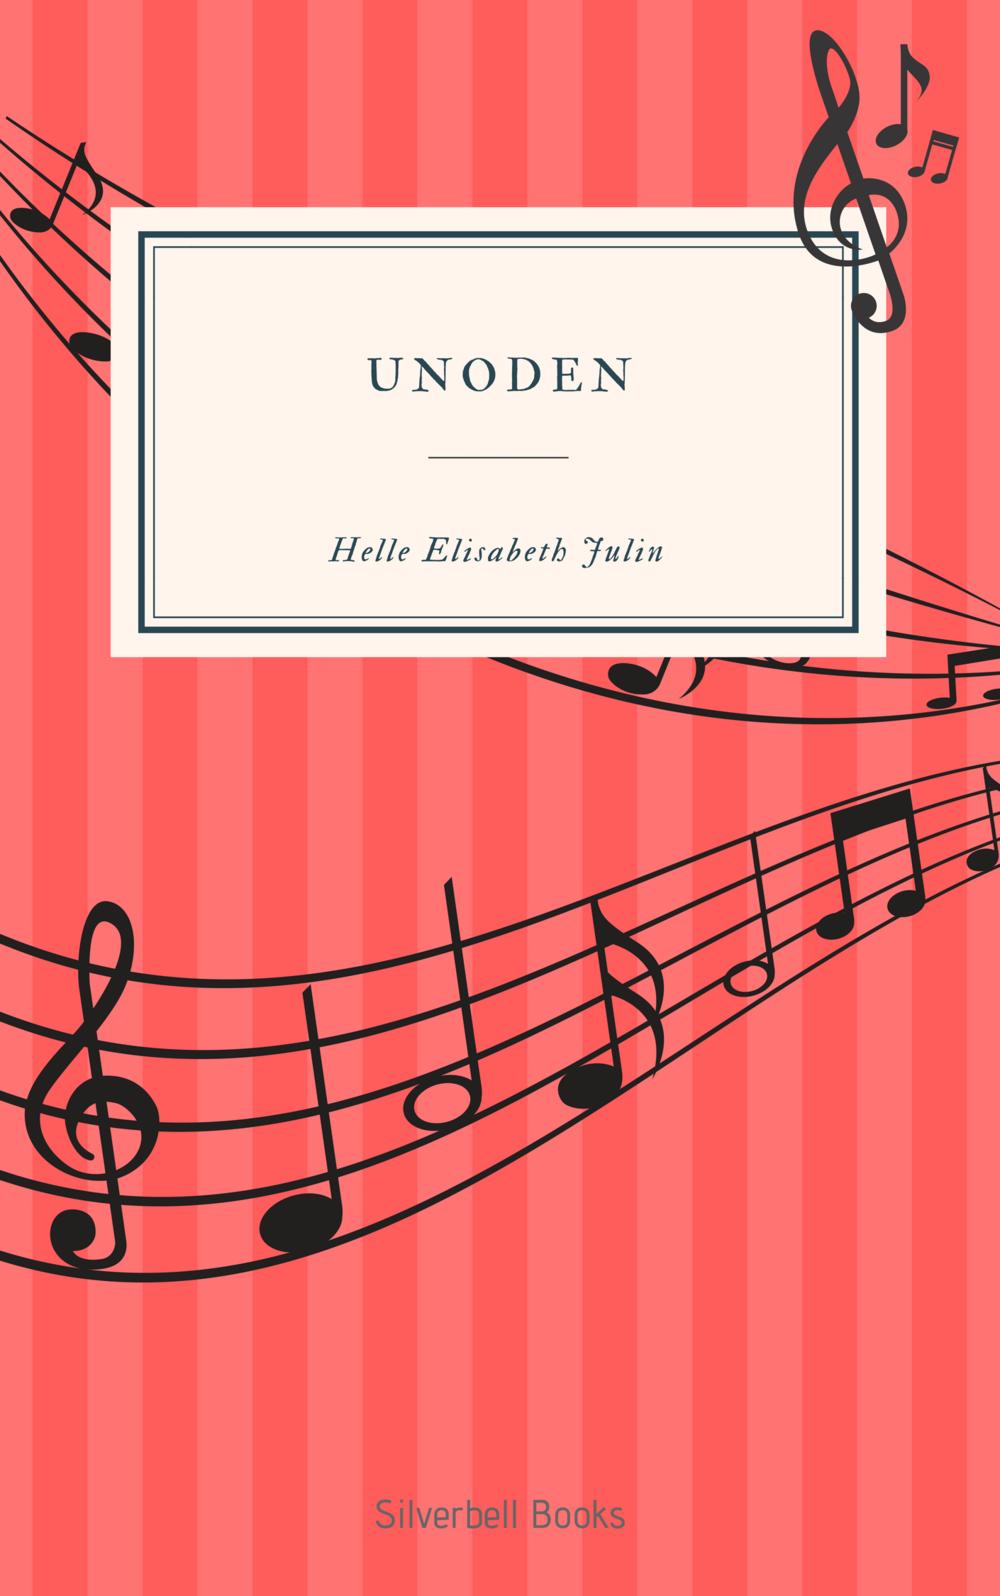 Copy of Unoden